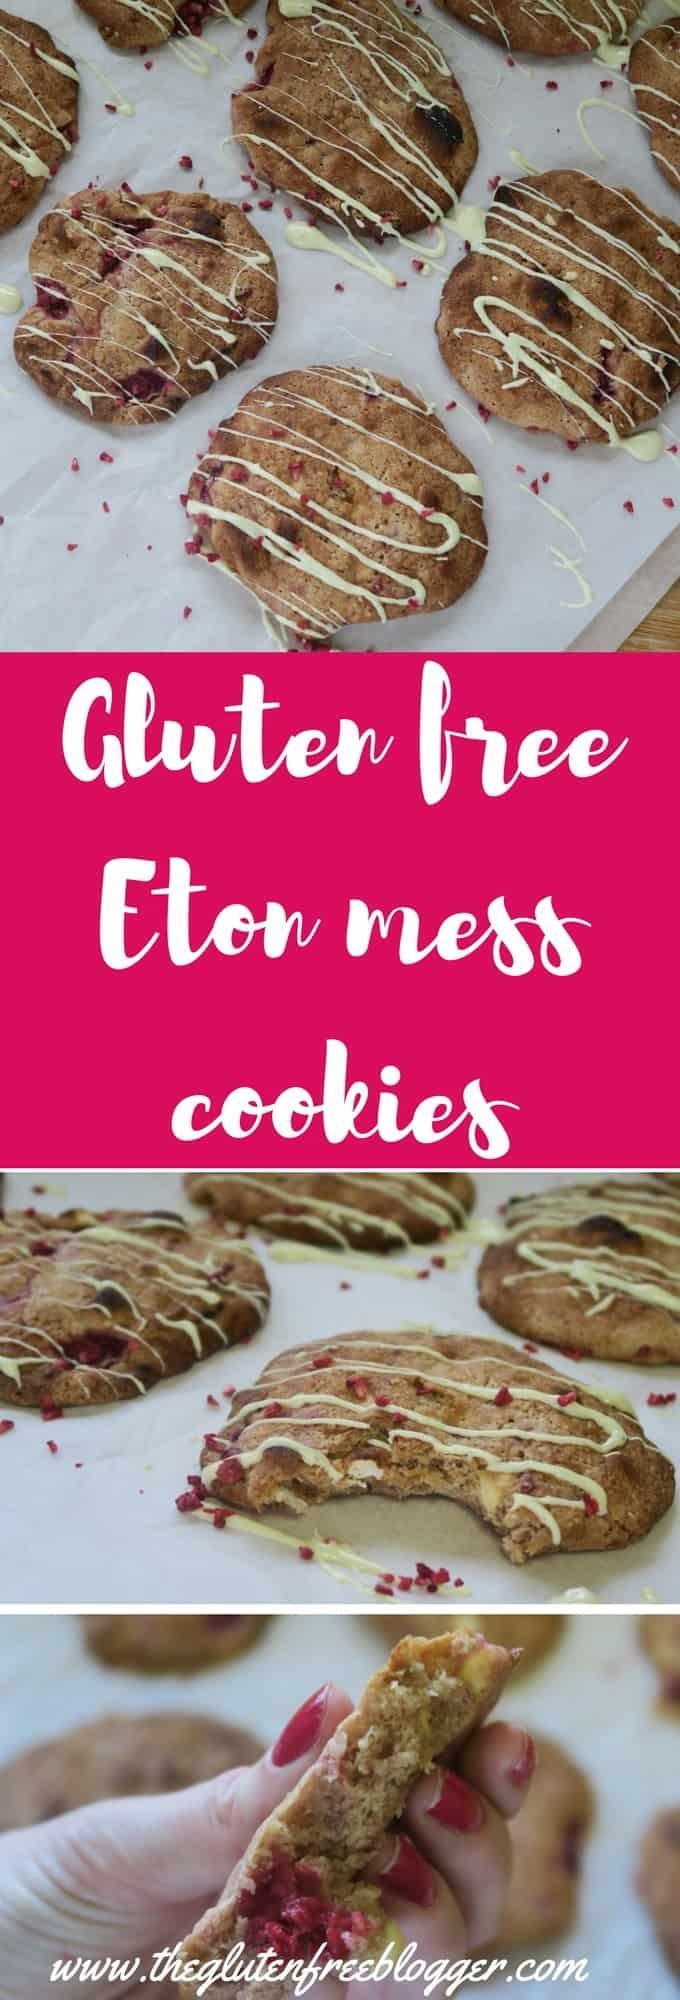 Gluten free Eton mess cookies recipe - chewy cookies recipe - www.theglutenfreeblogger.com